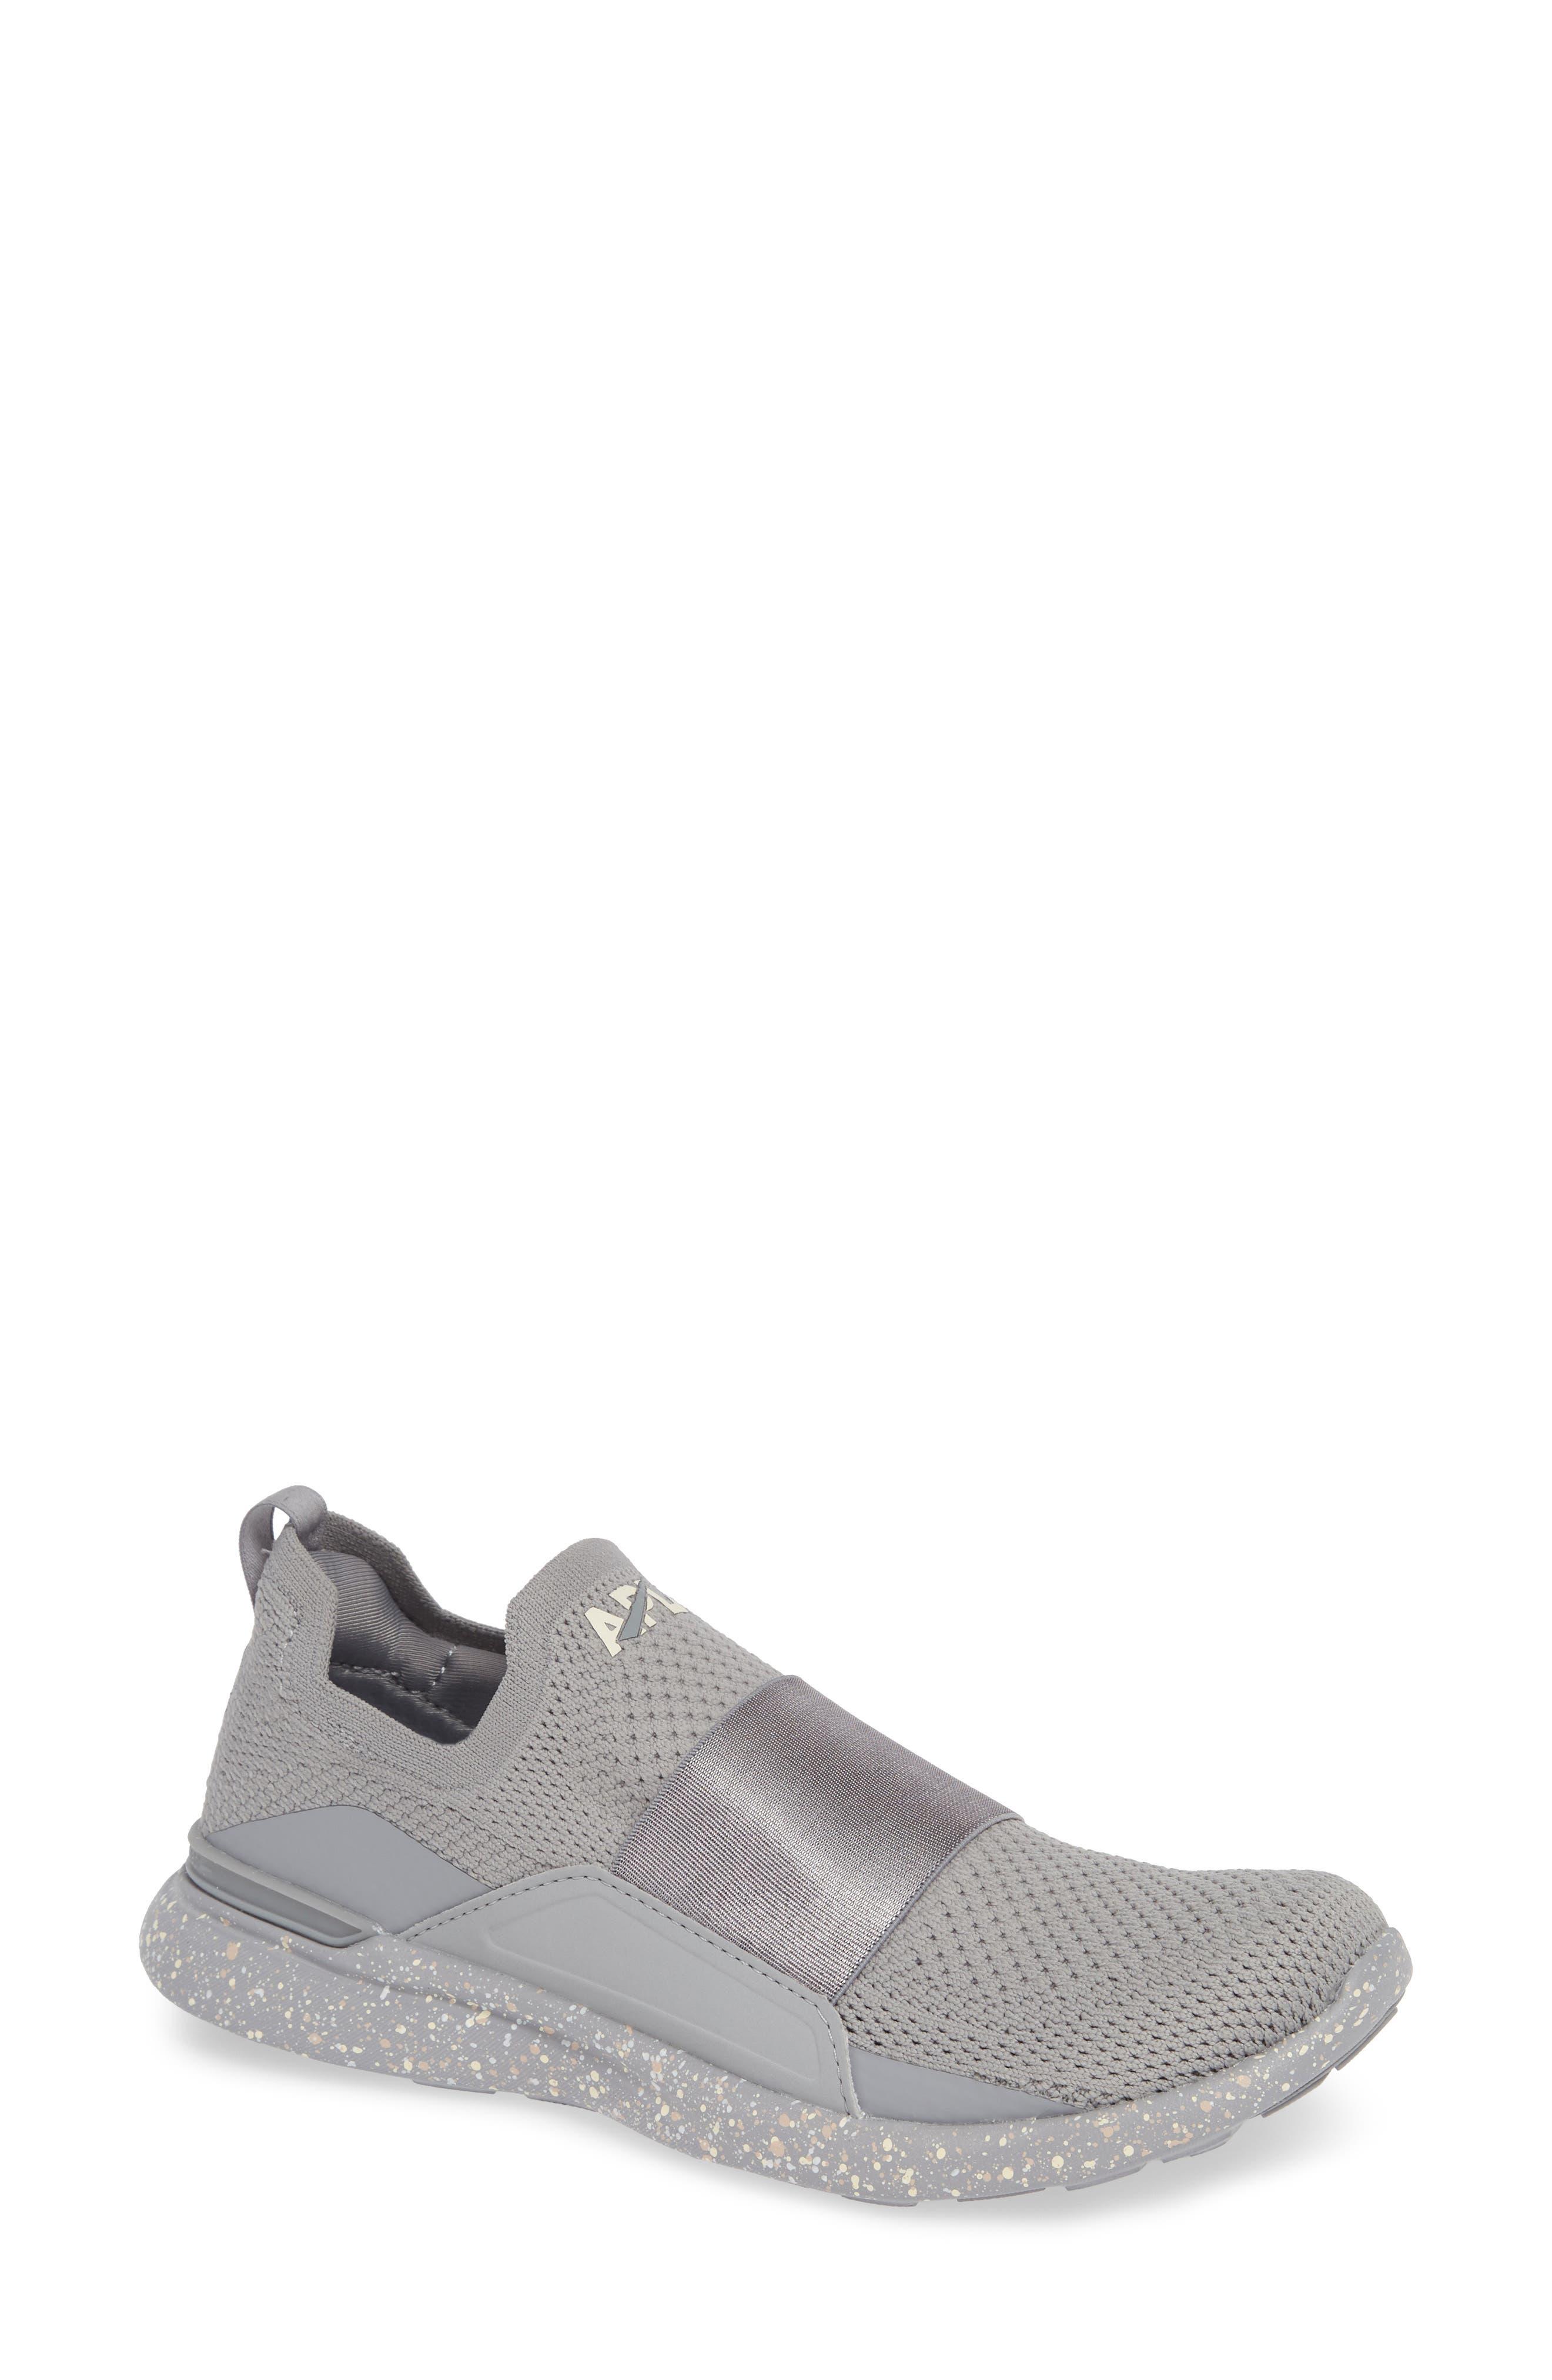 APL Techloom Bliss Knit Running Shoe, Main, color, CEMENT/ SEA SALT/ CREAM